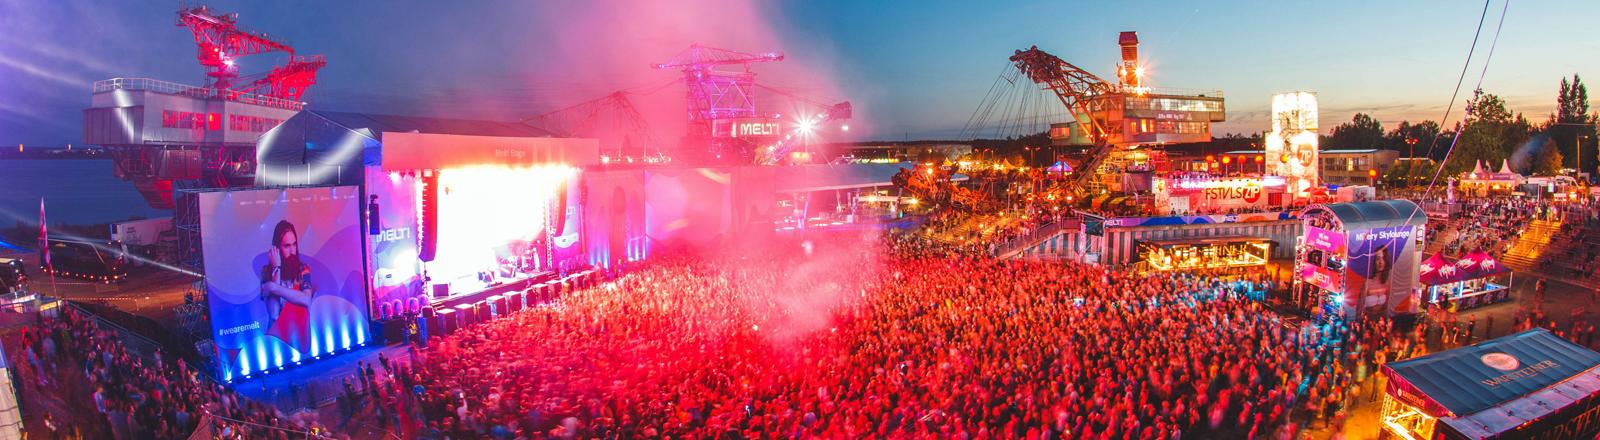 Die Hauptbühne des Melt-Festivals am 17.07.2016.